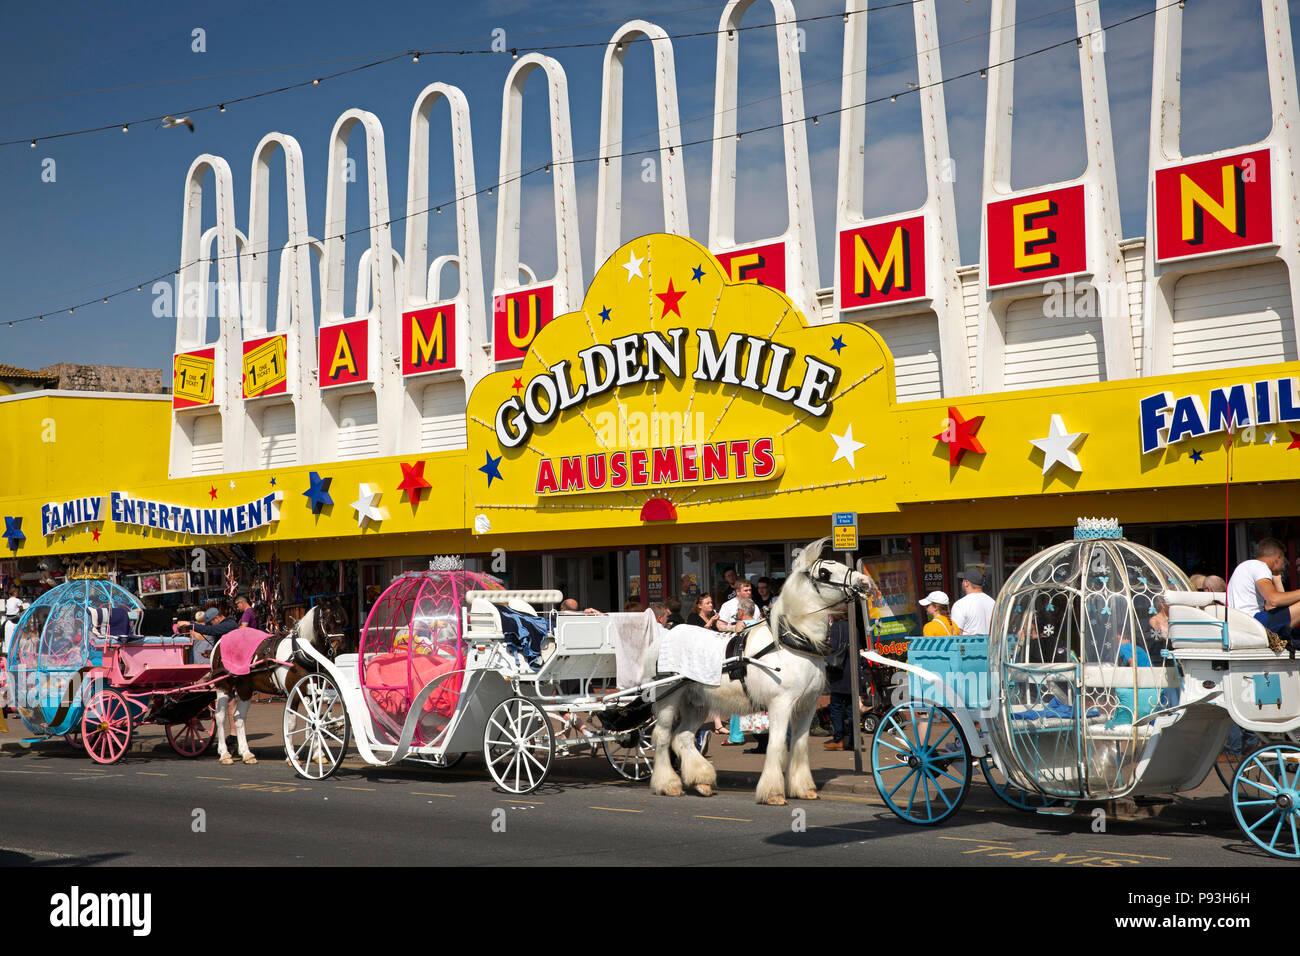 UK, England, Lancashire, Blackpool, Promenade, passenger carriages outside Golden Mile amusement arcade - Stock Image